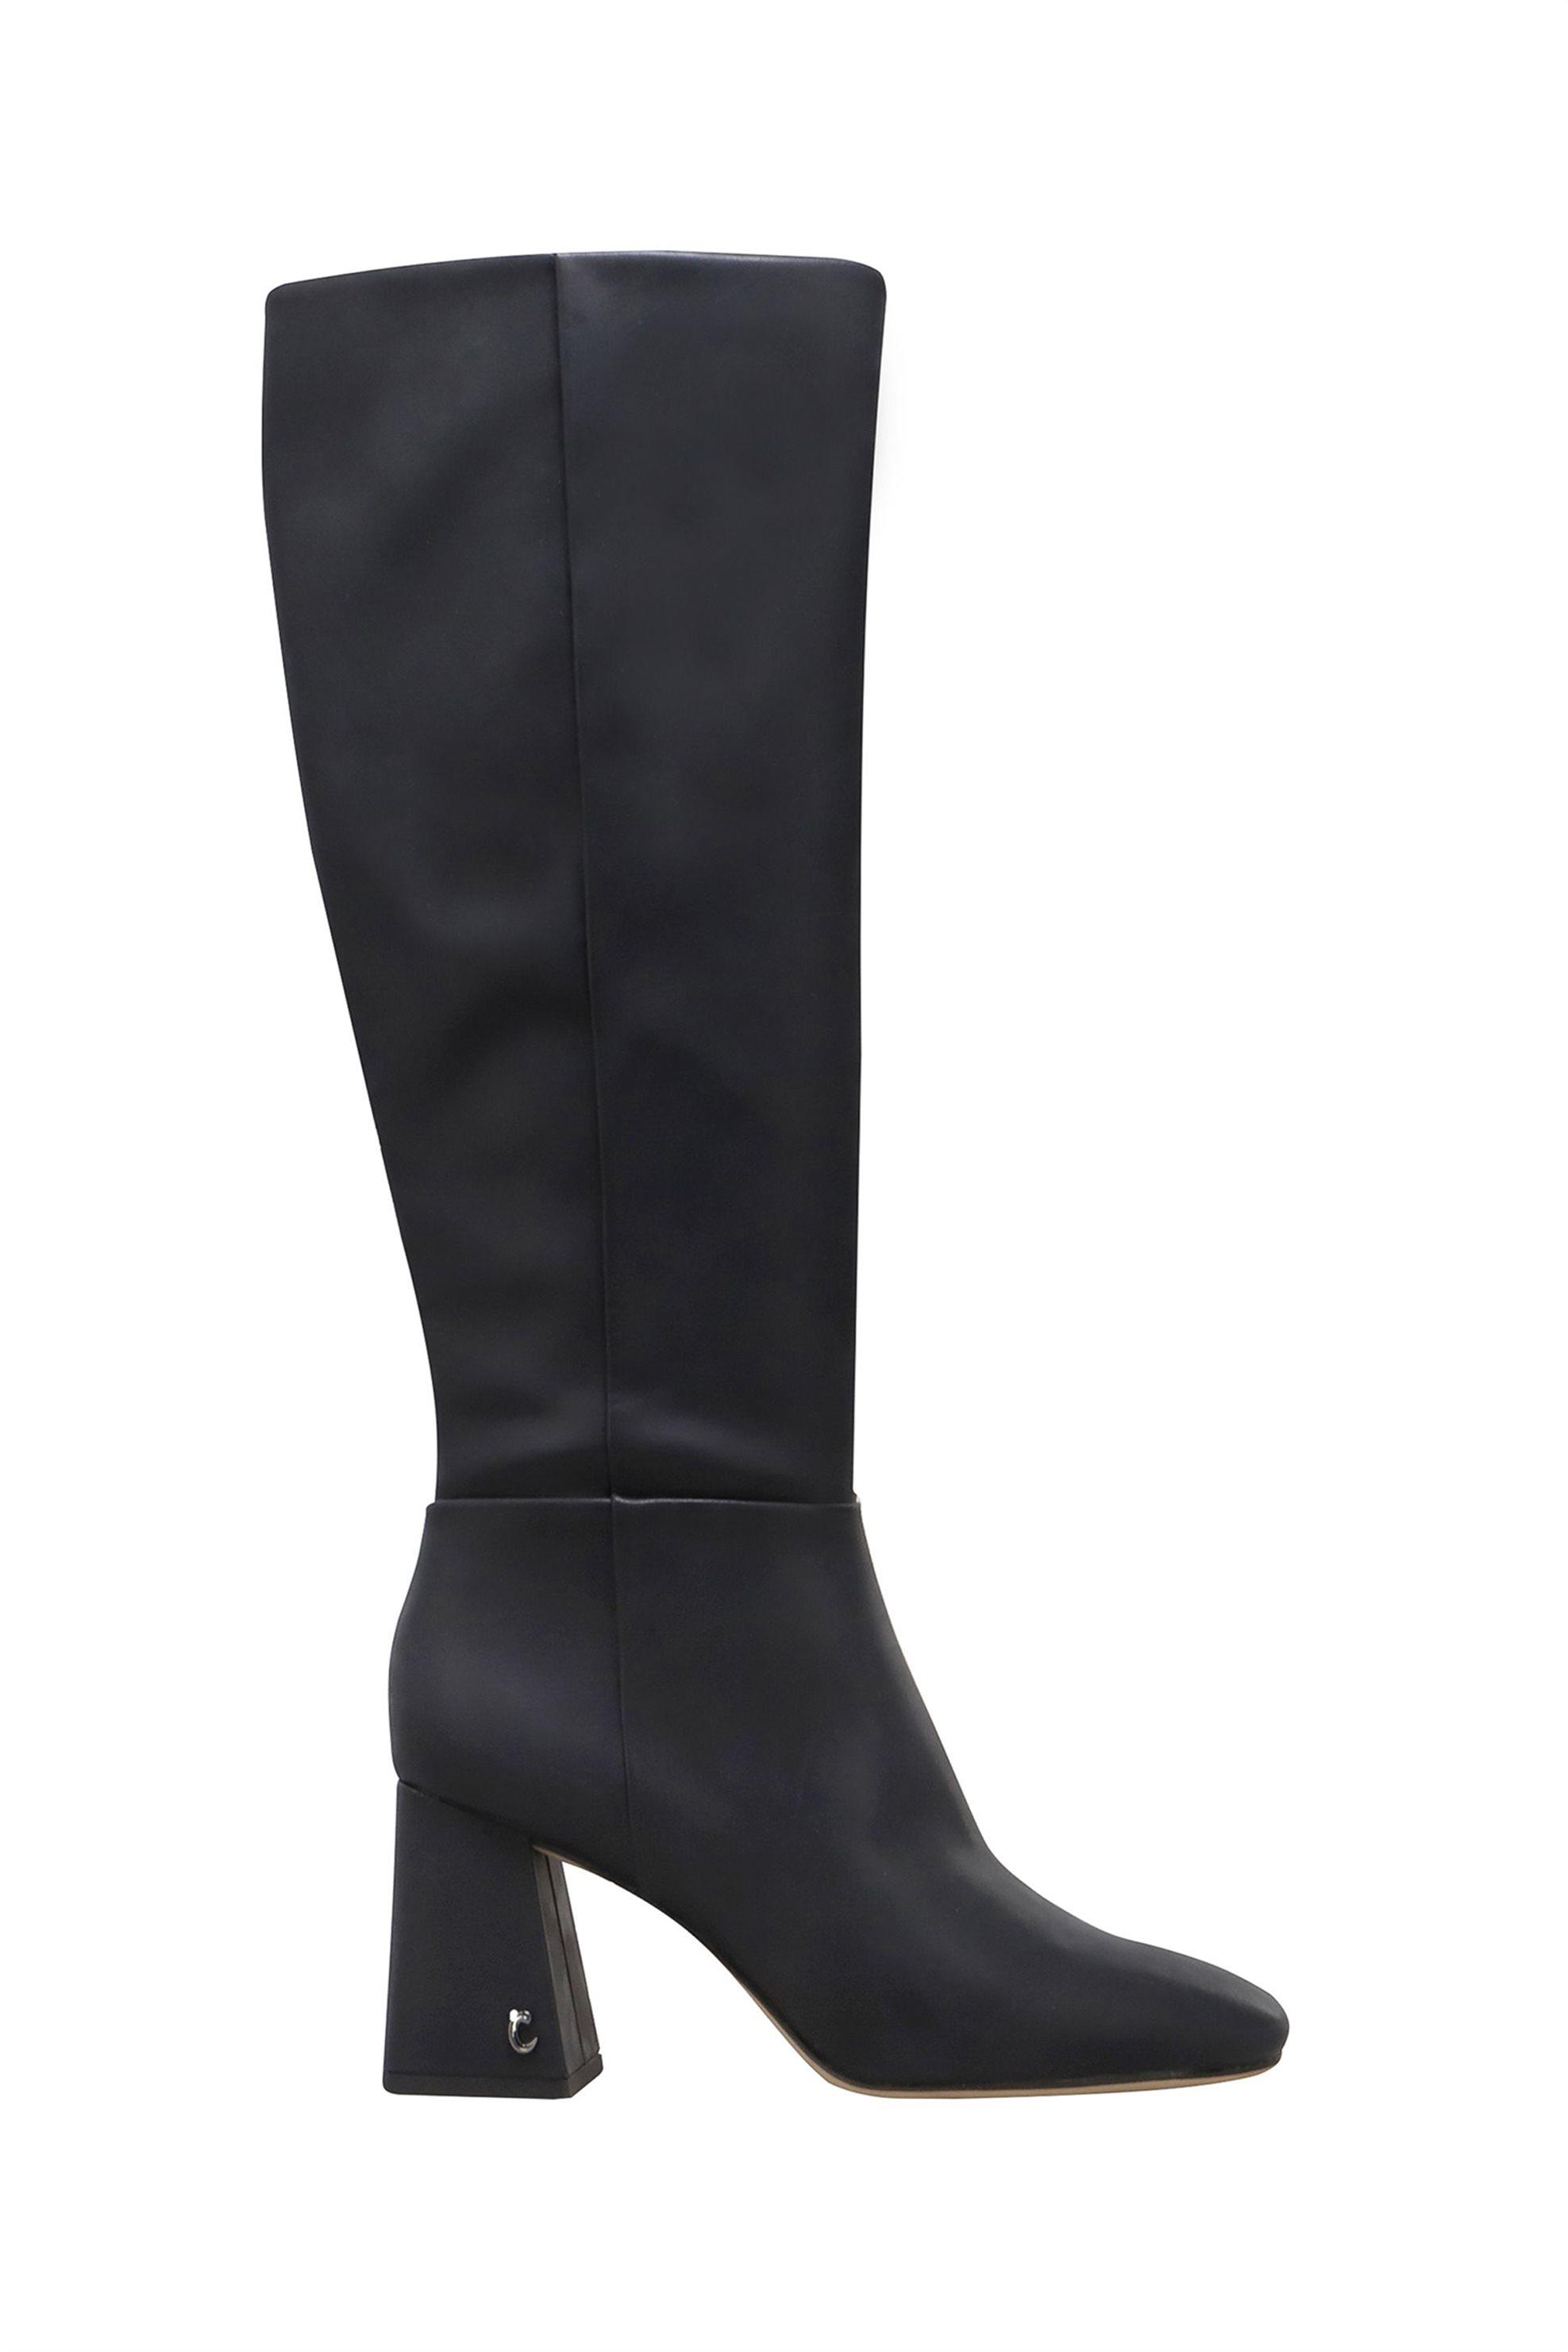 "Circus by Sam Edelman γυναικείες μπότες με χοντρό τακούνι ""Karina"" – H4124S1001 – Μαύρο"